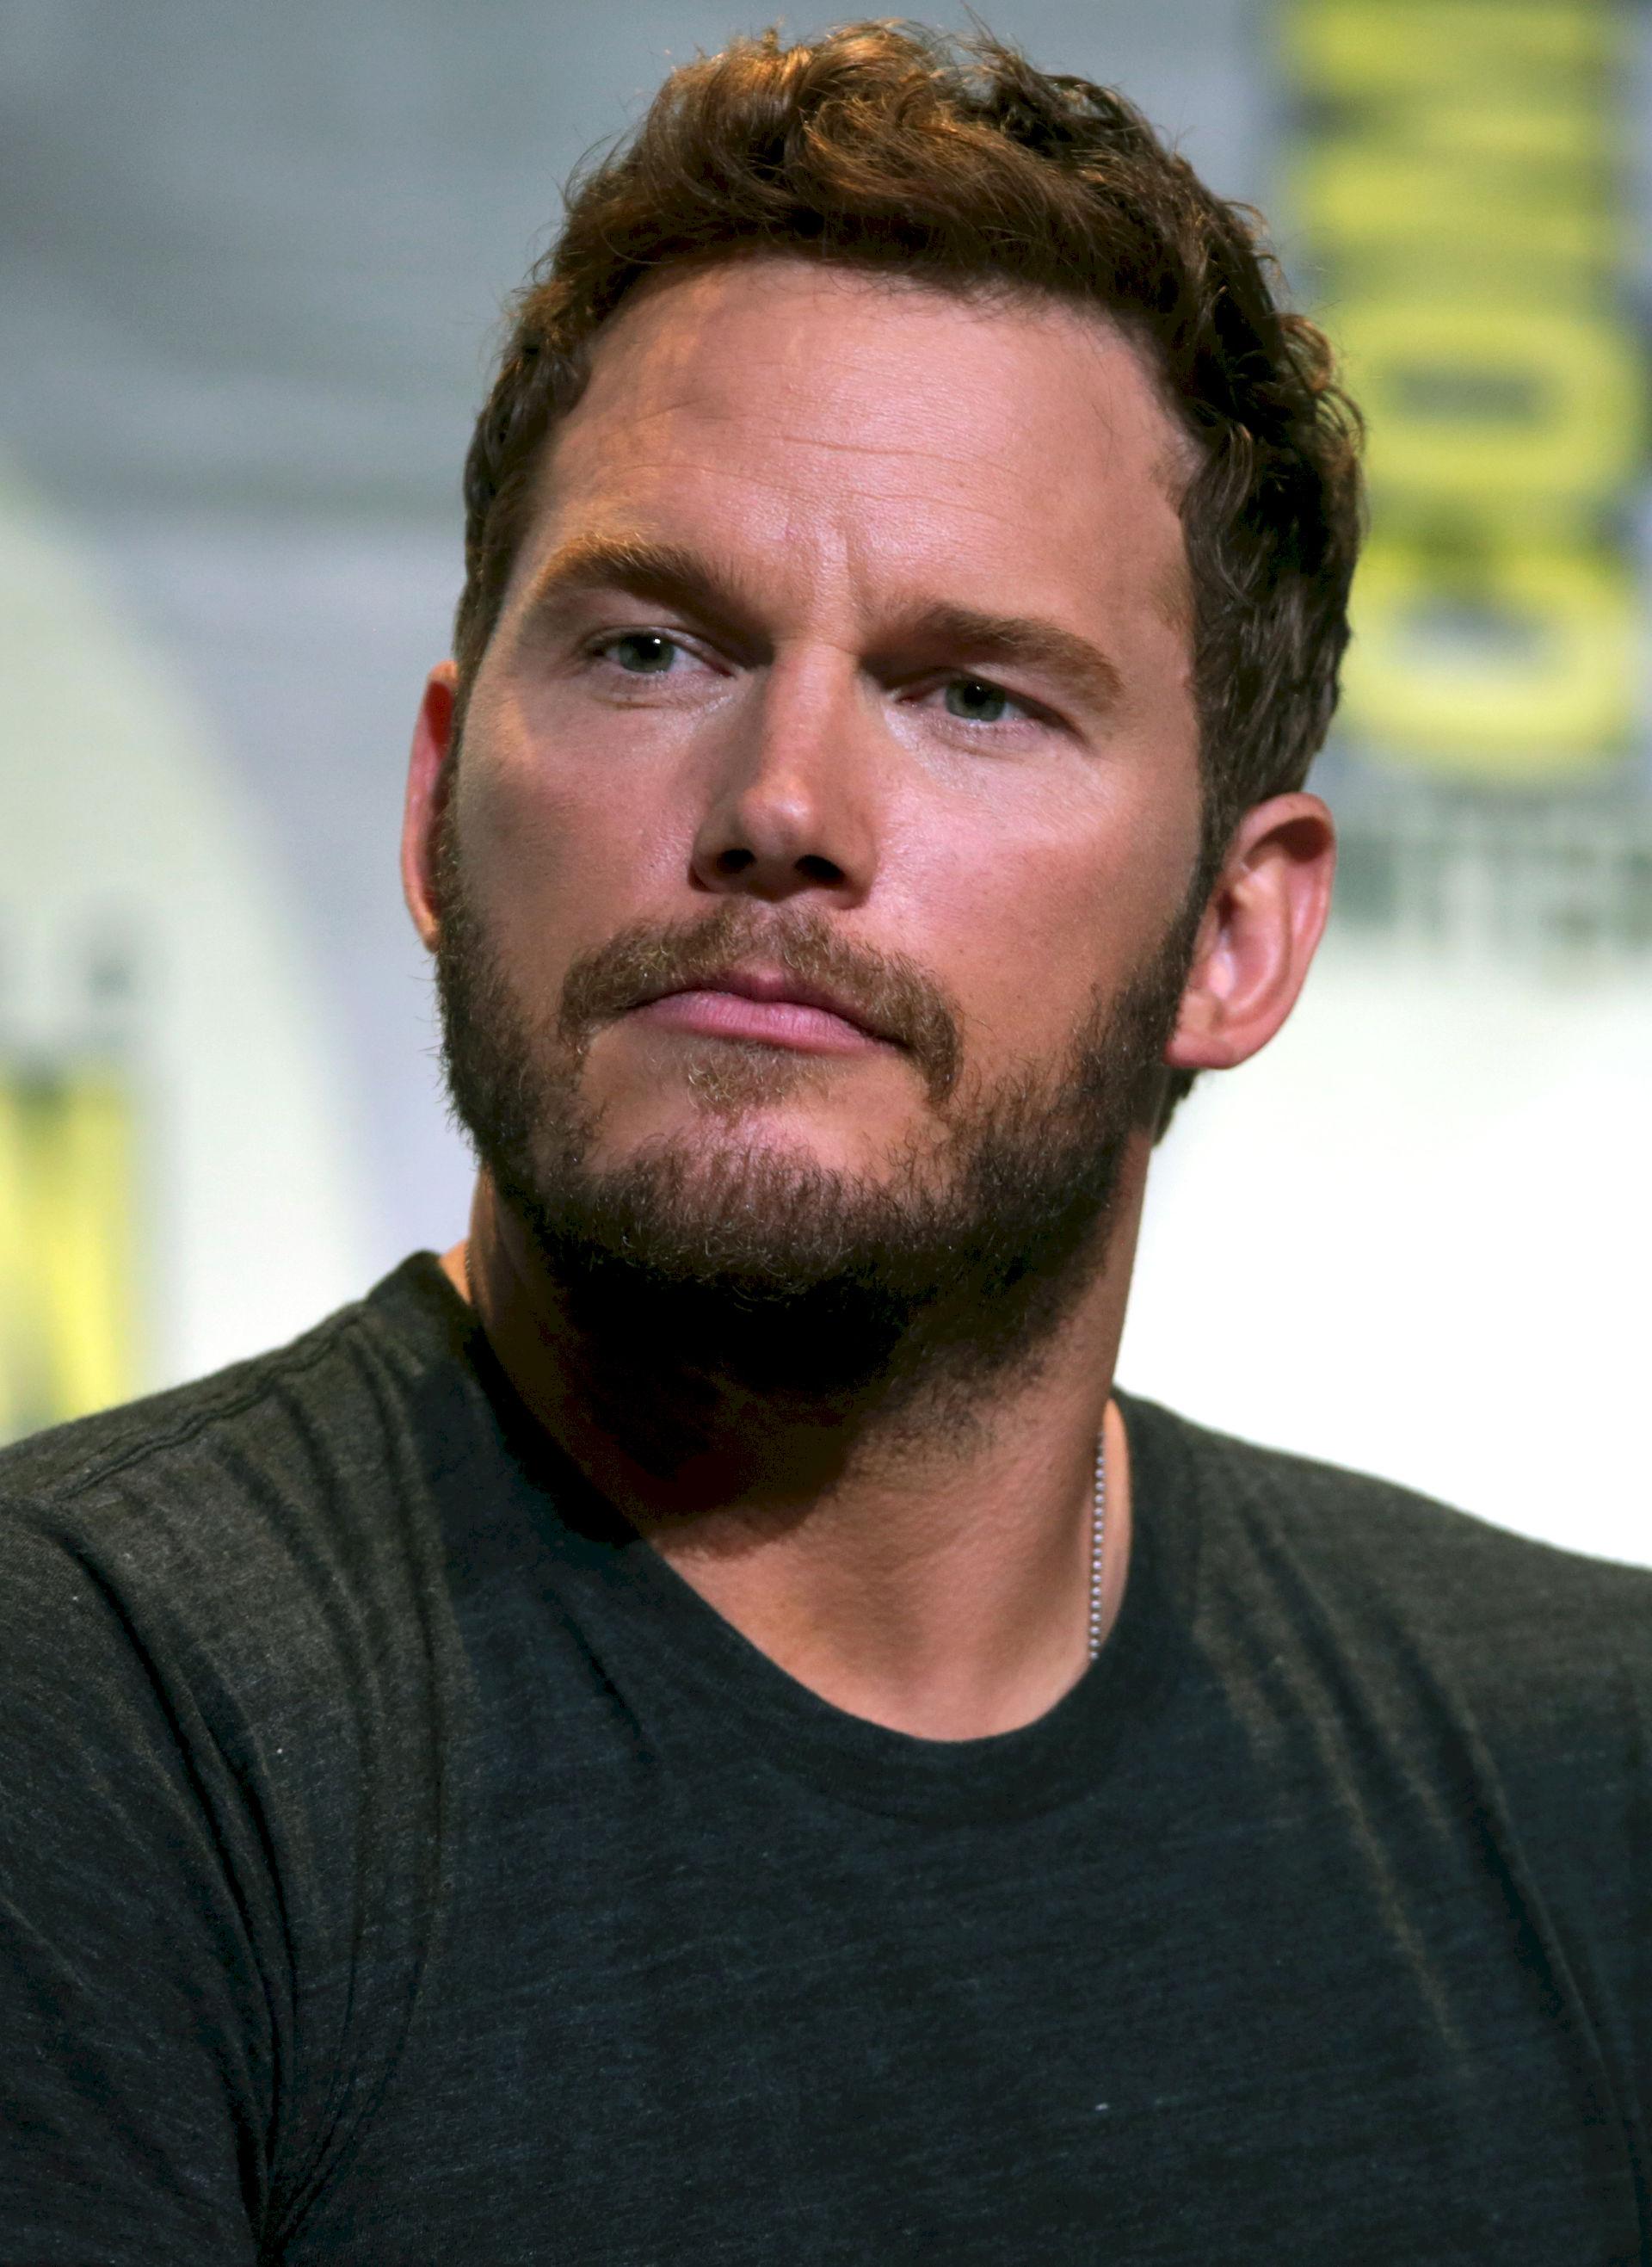 Photo of Chris Pratt: American actor